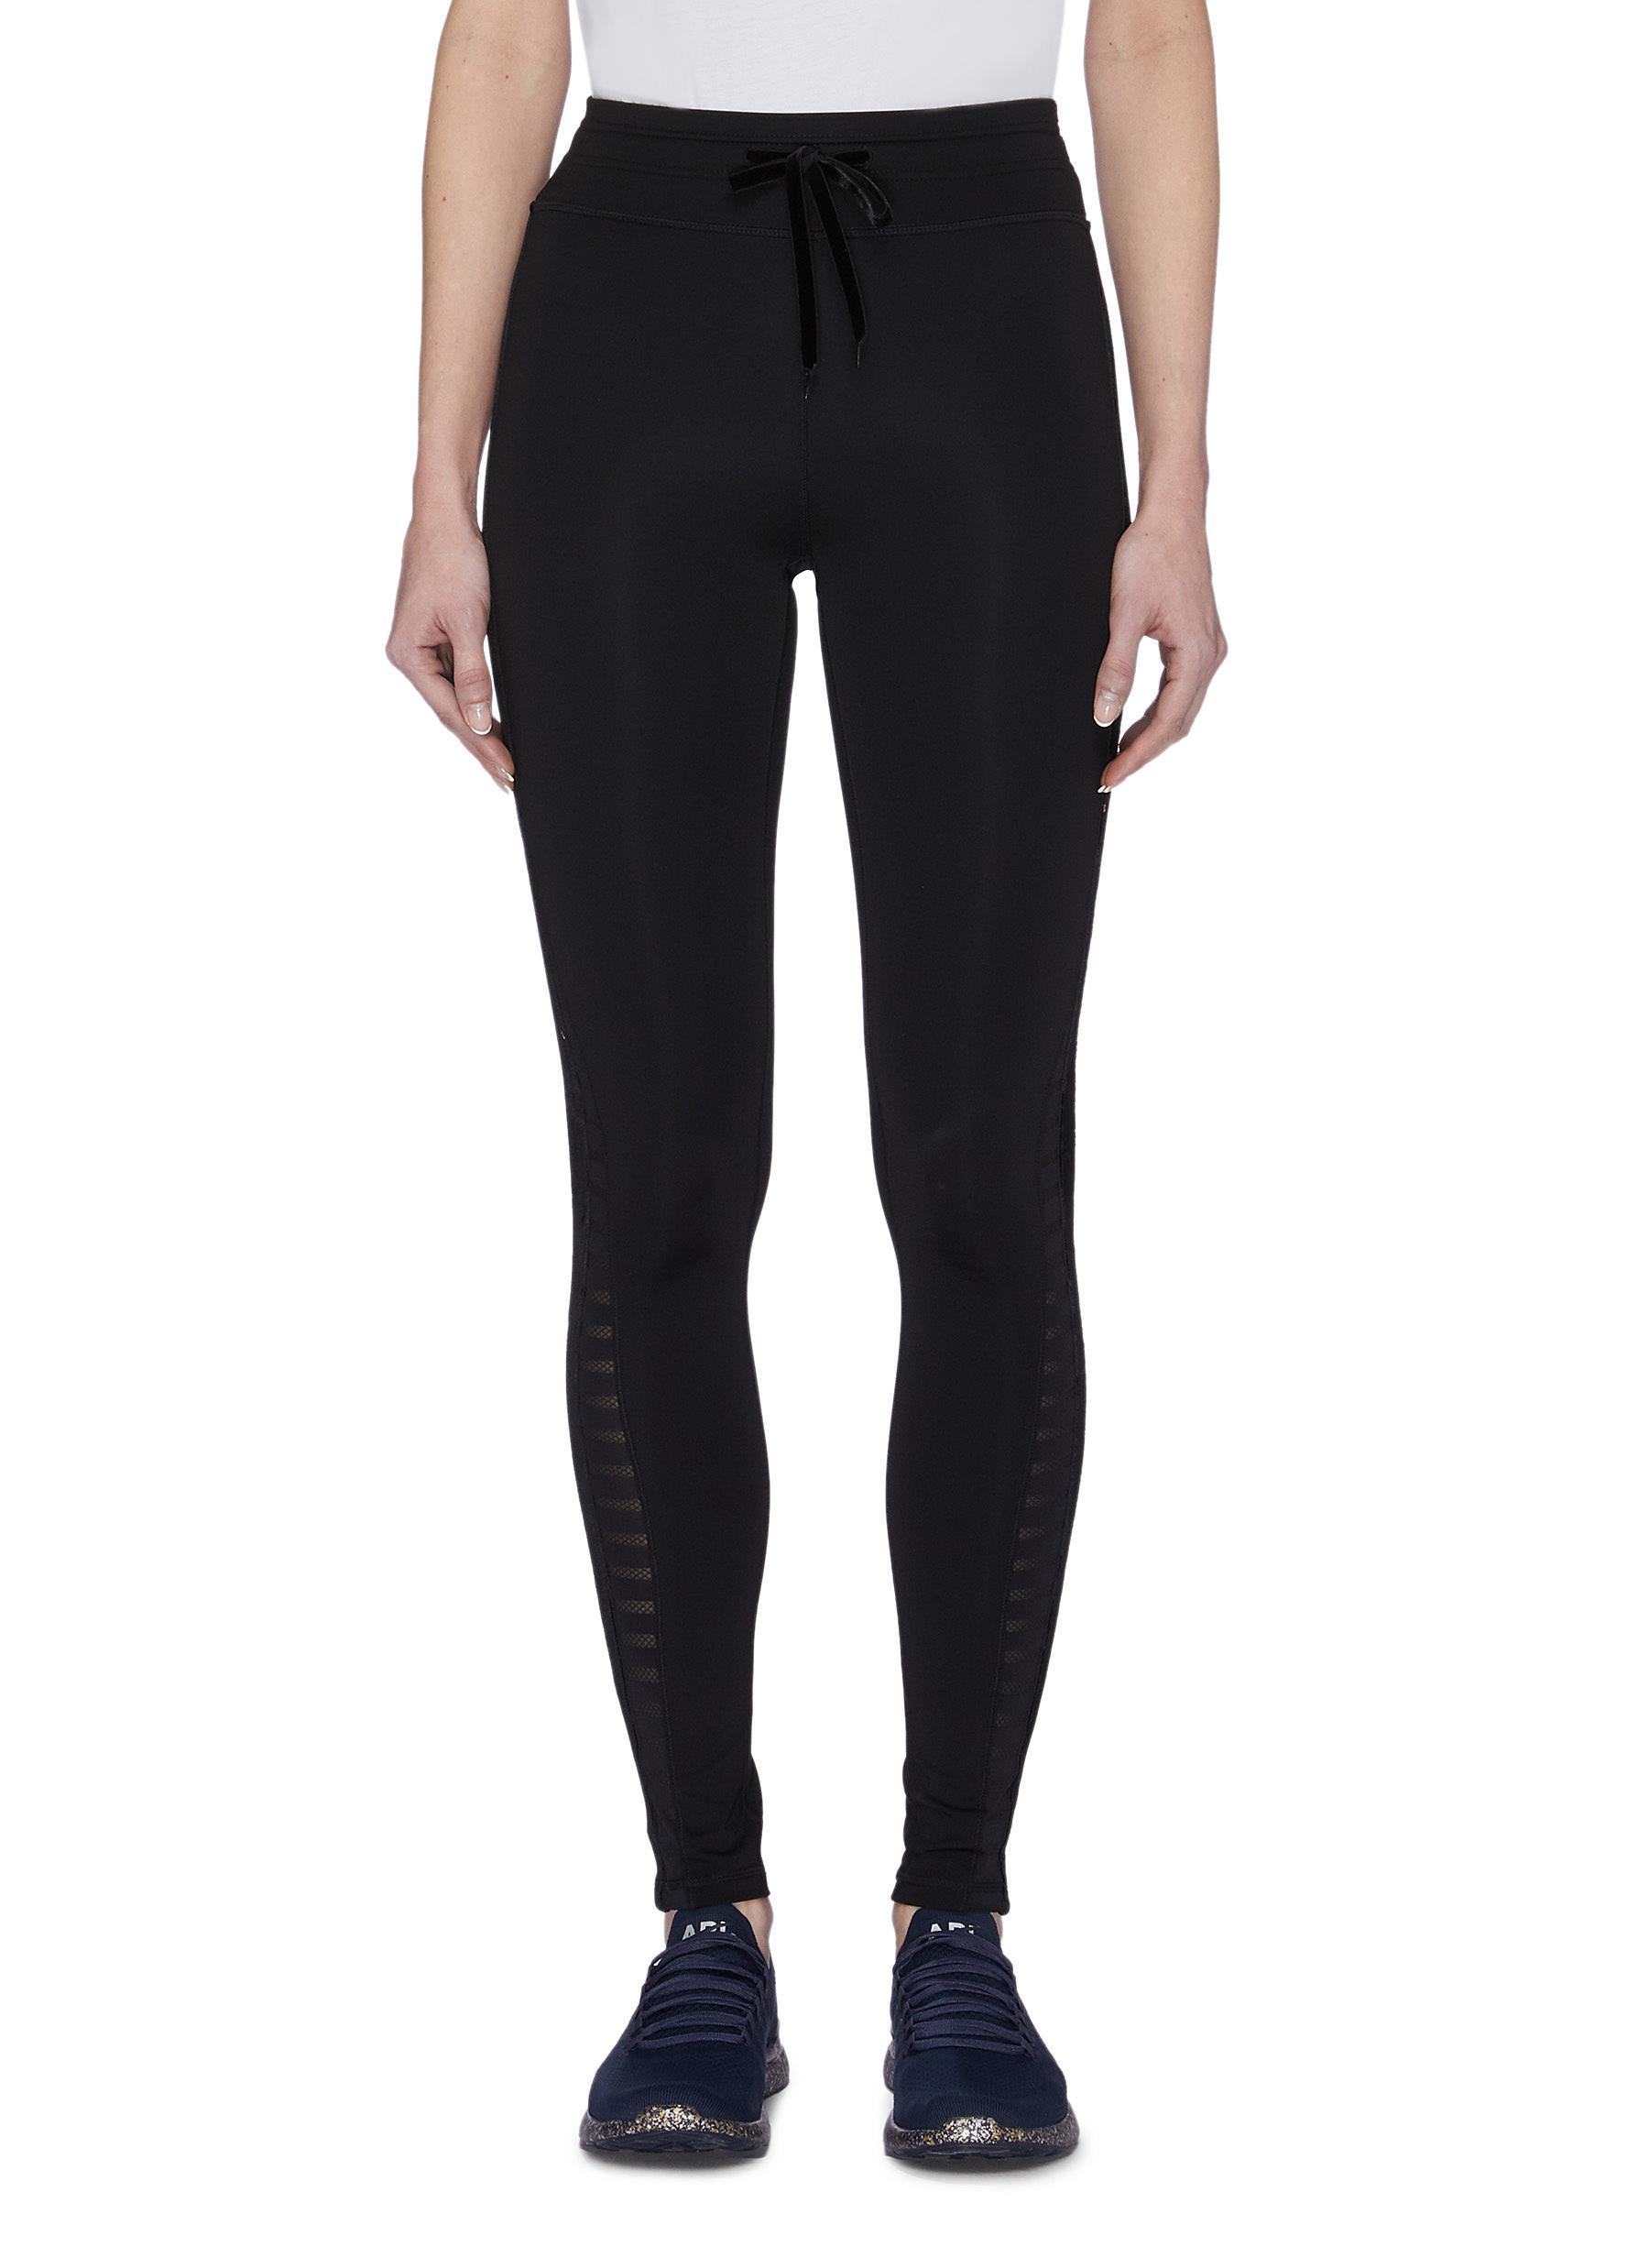 shop The Upside Performance Yoga Pants online